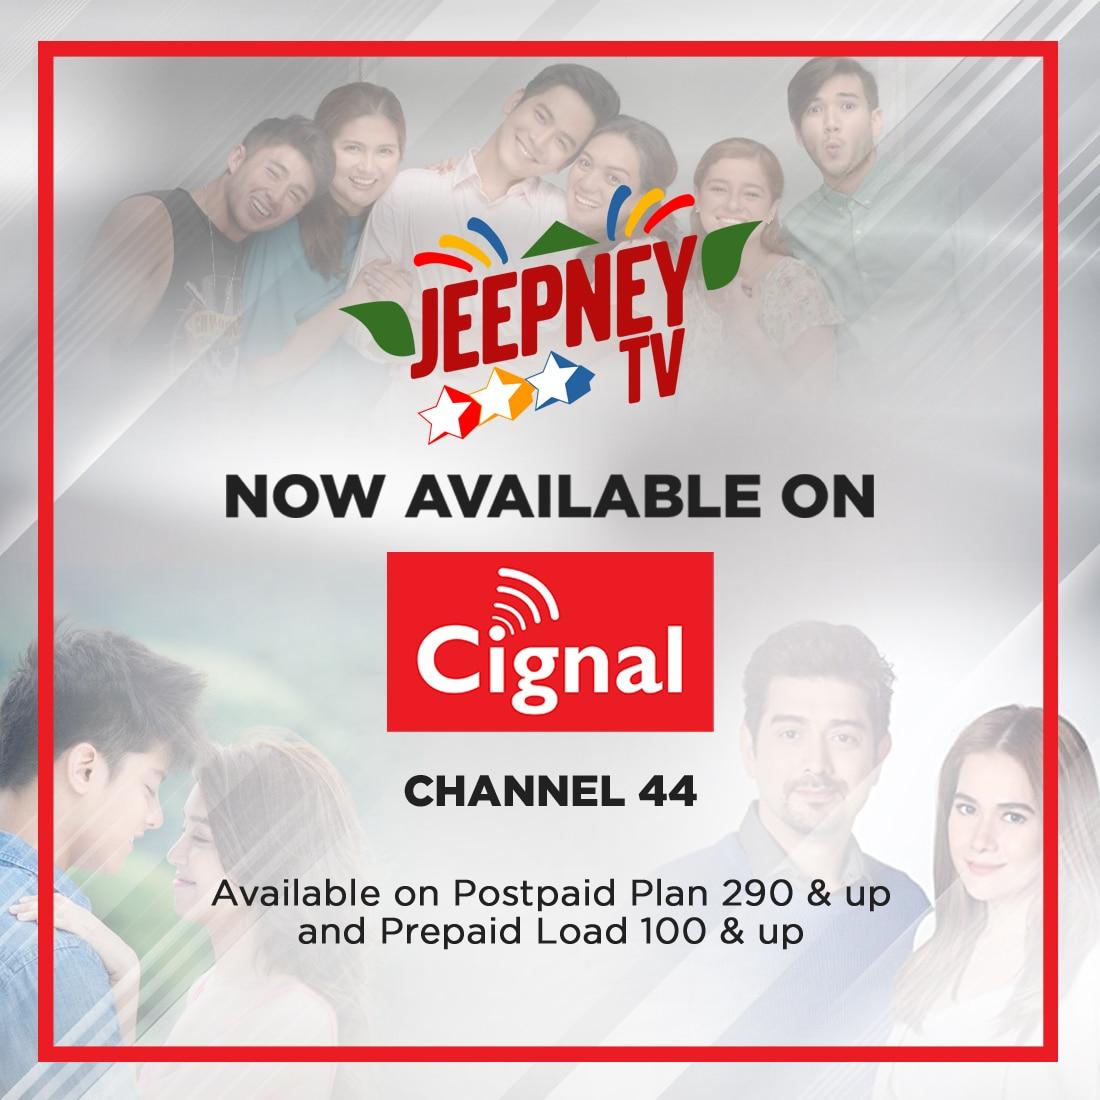 Jeepney TV on Cignal